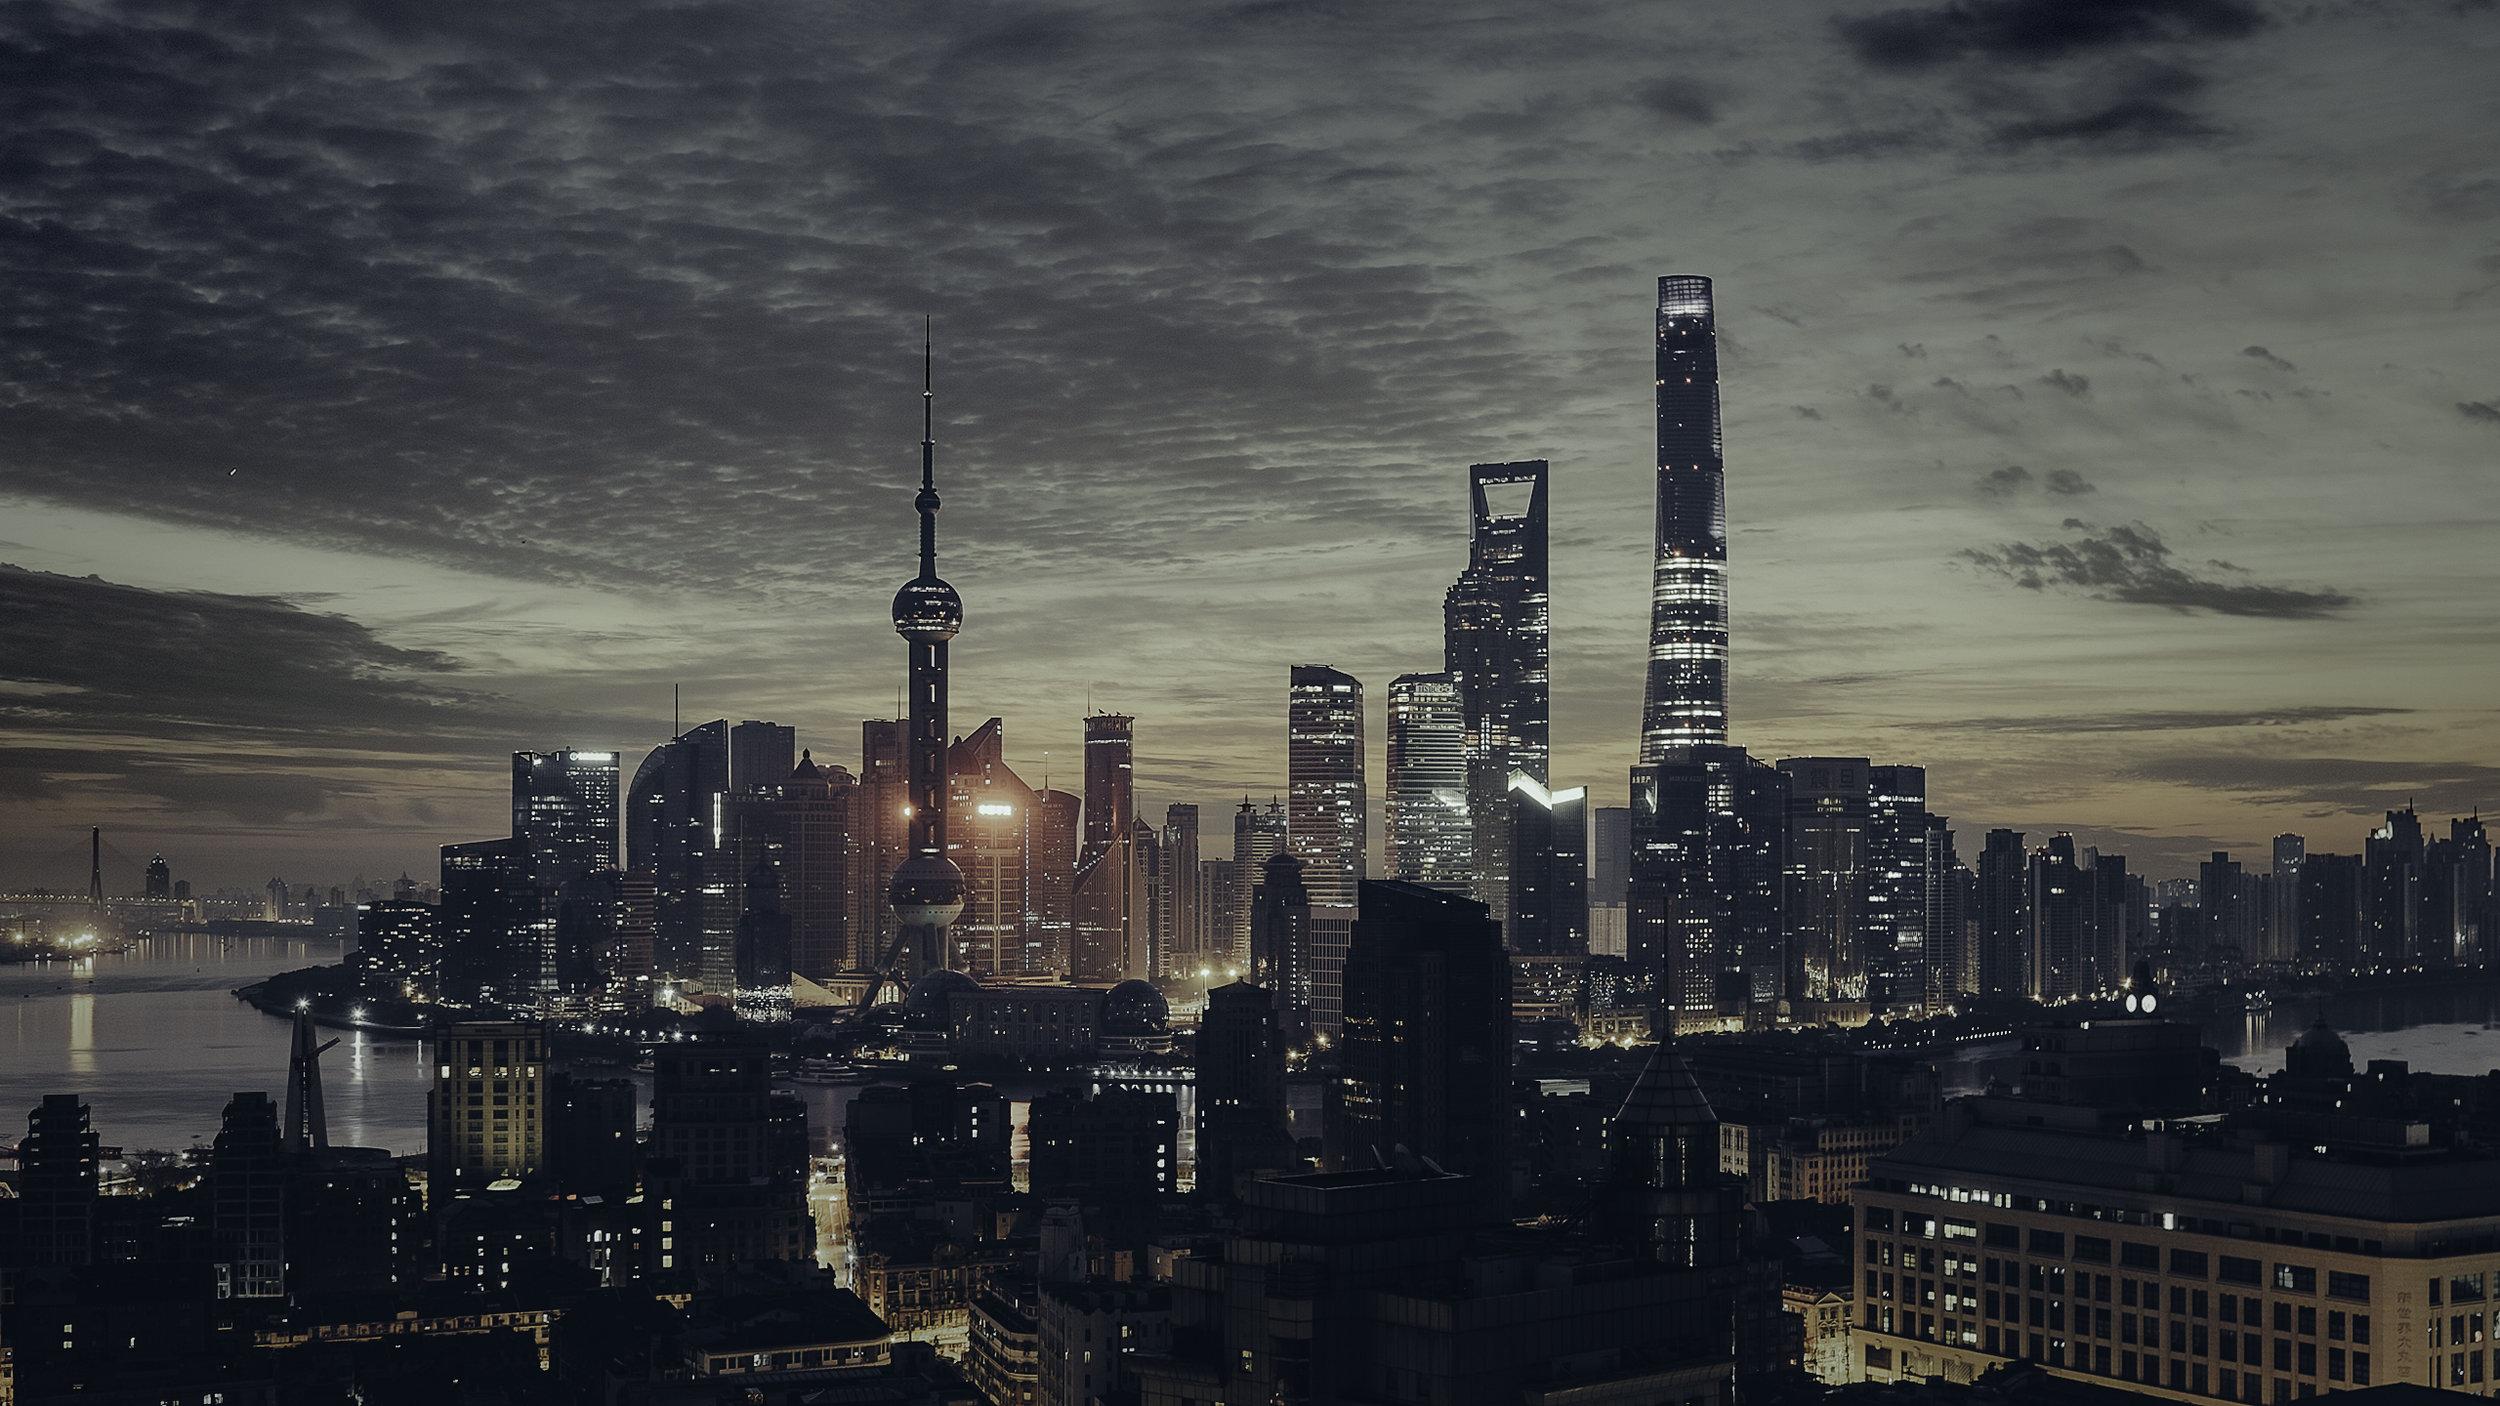 chinas social credit system